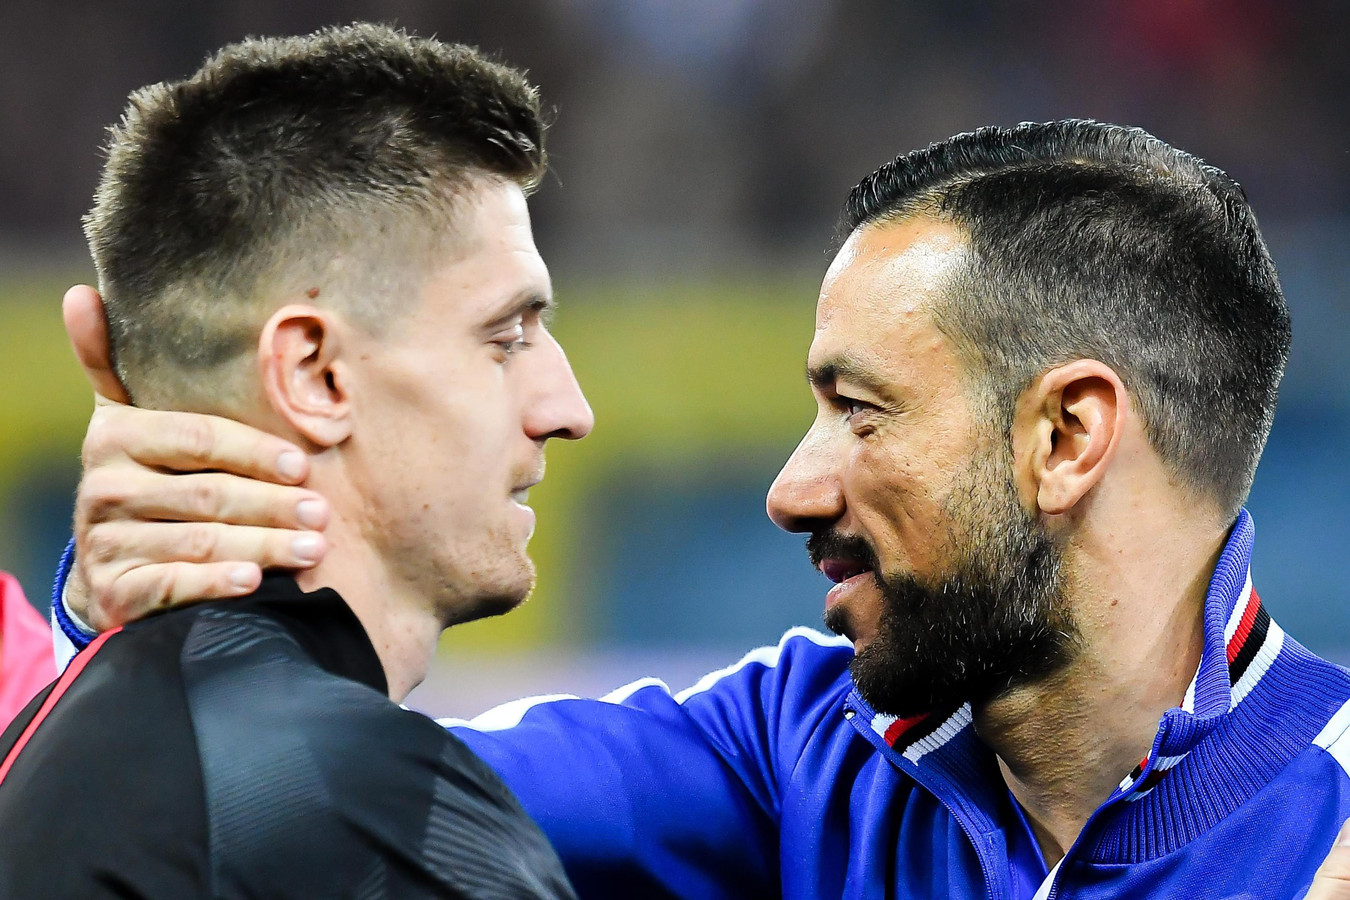 Krzysztof Piatek en Fabio Quagliarella voor Sampdoria - AC Milan vorige maand.